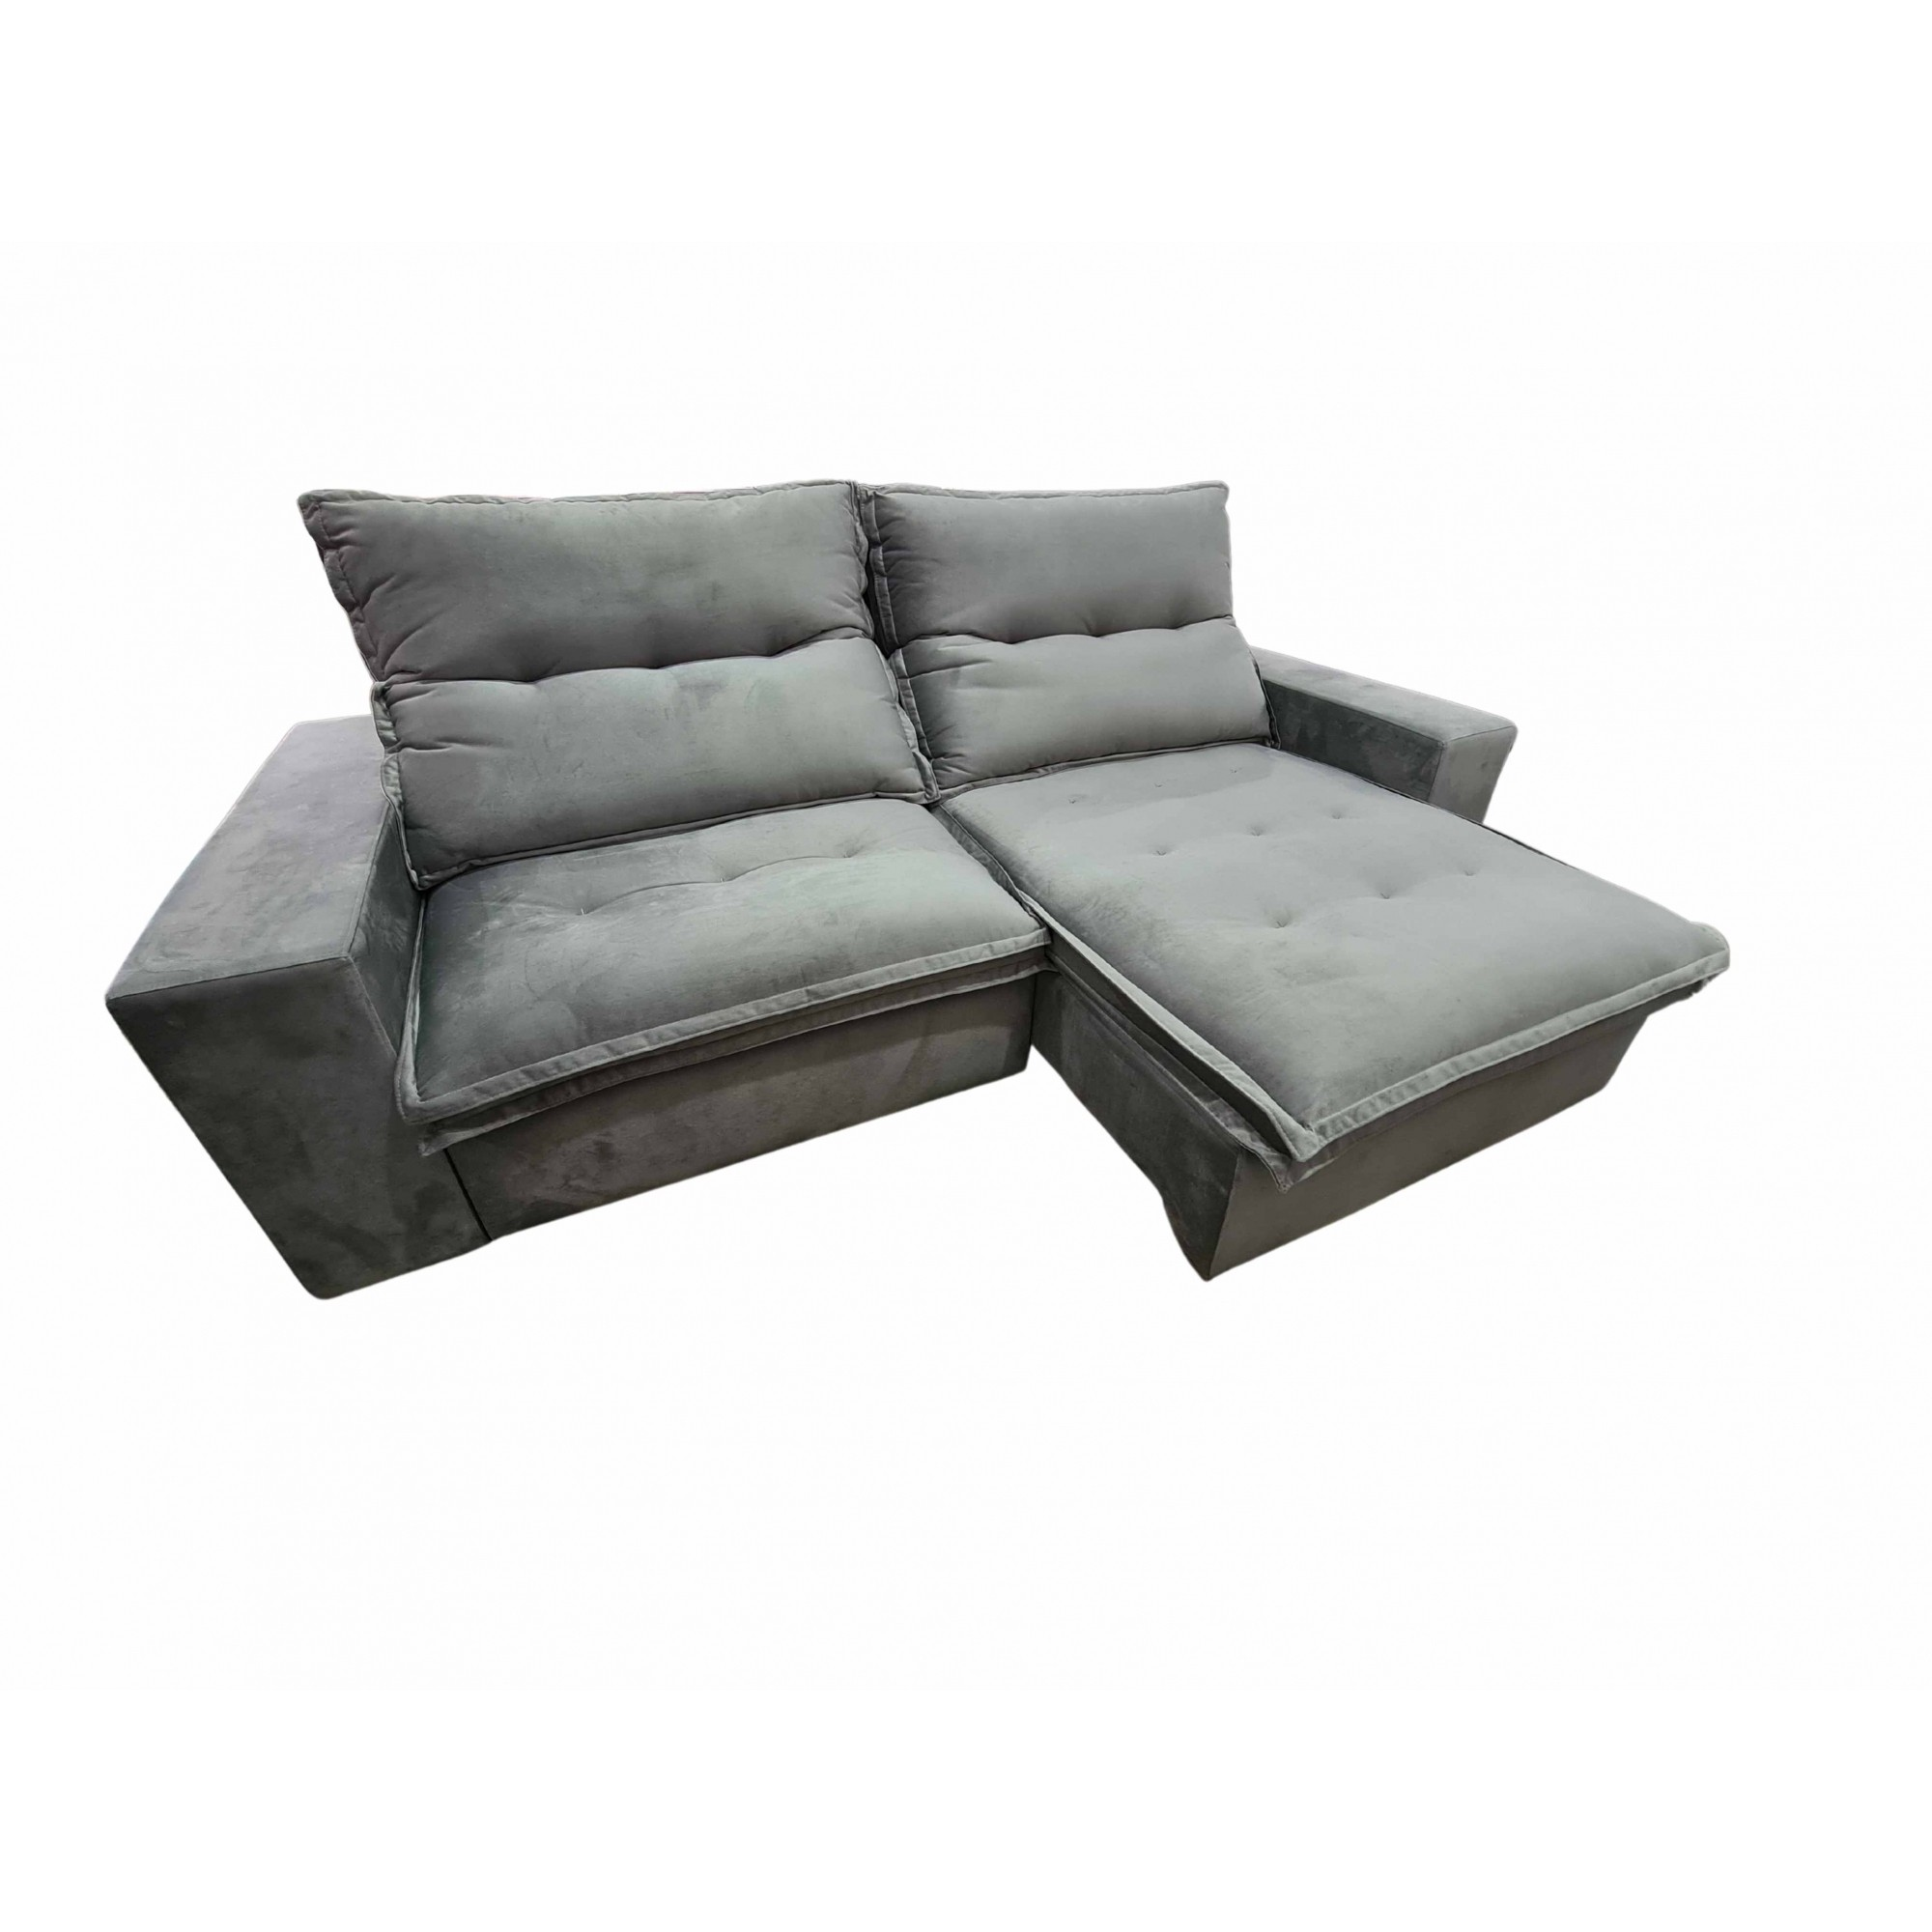 Sofa Retrátil 3 Lugares 250 cm Davos Cinza Claro